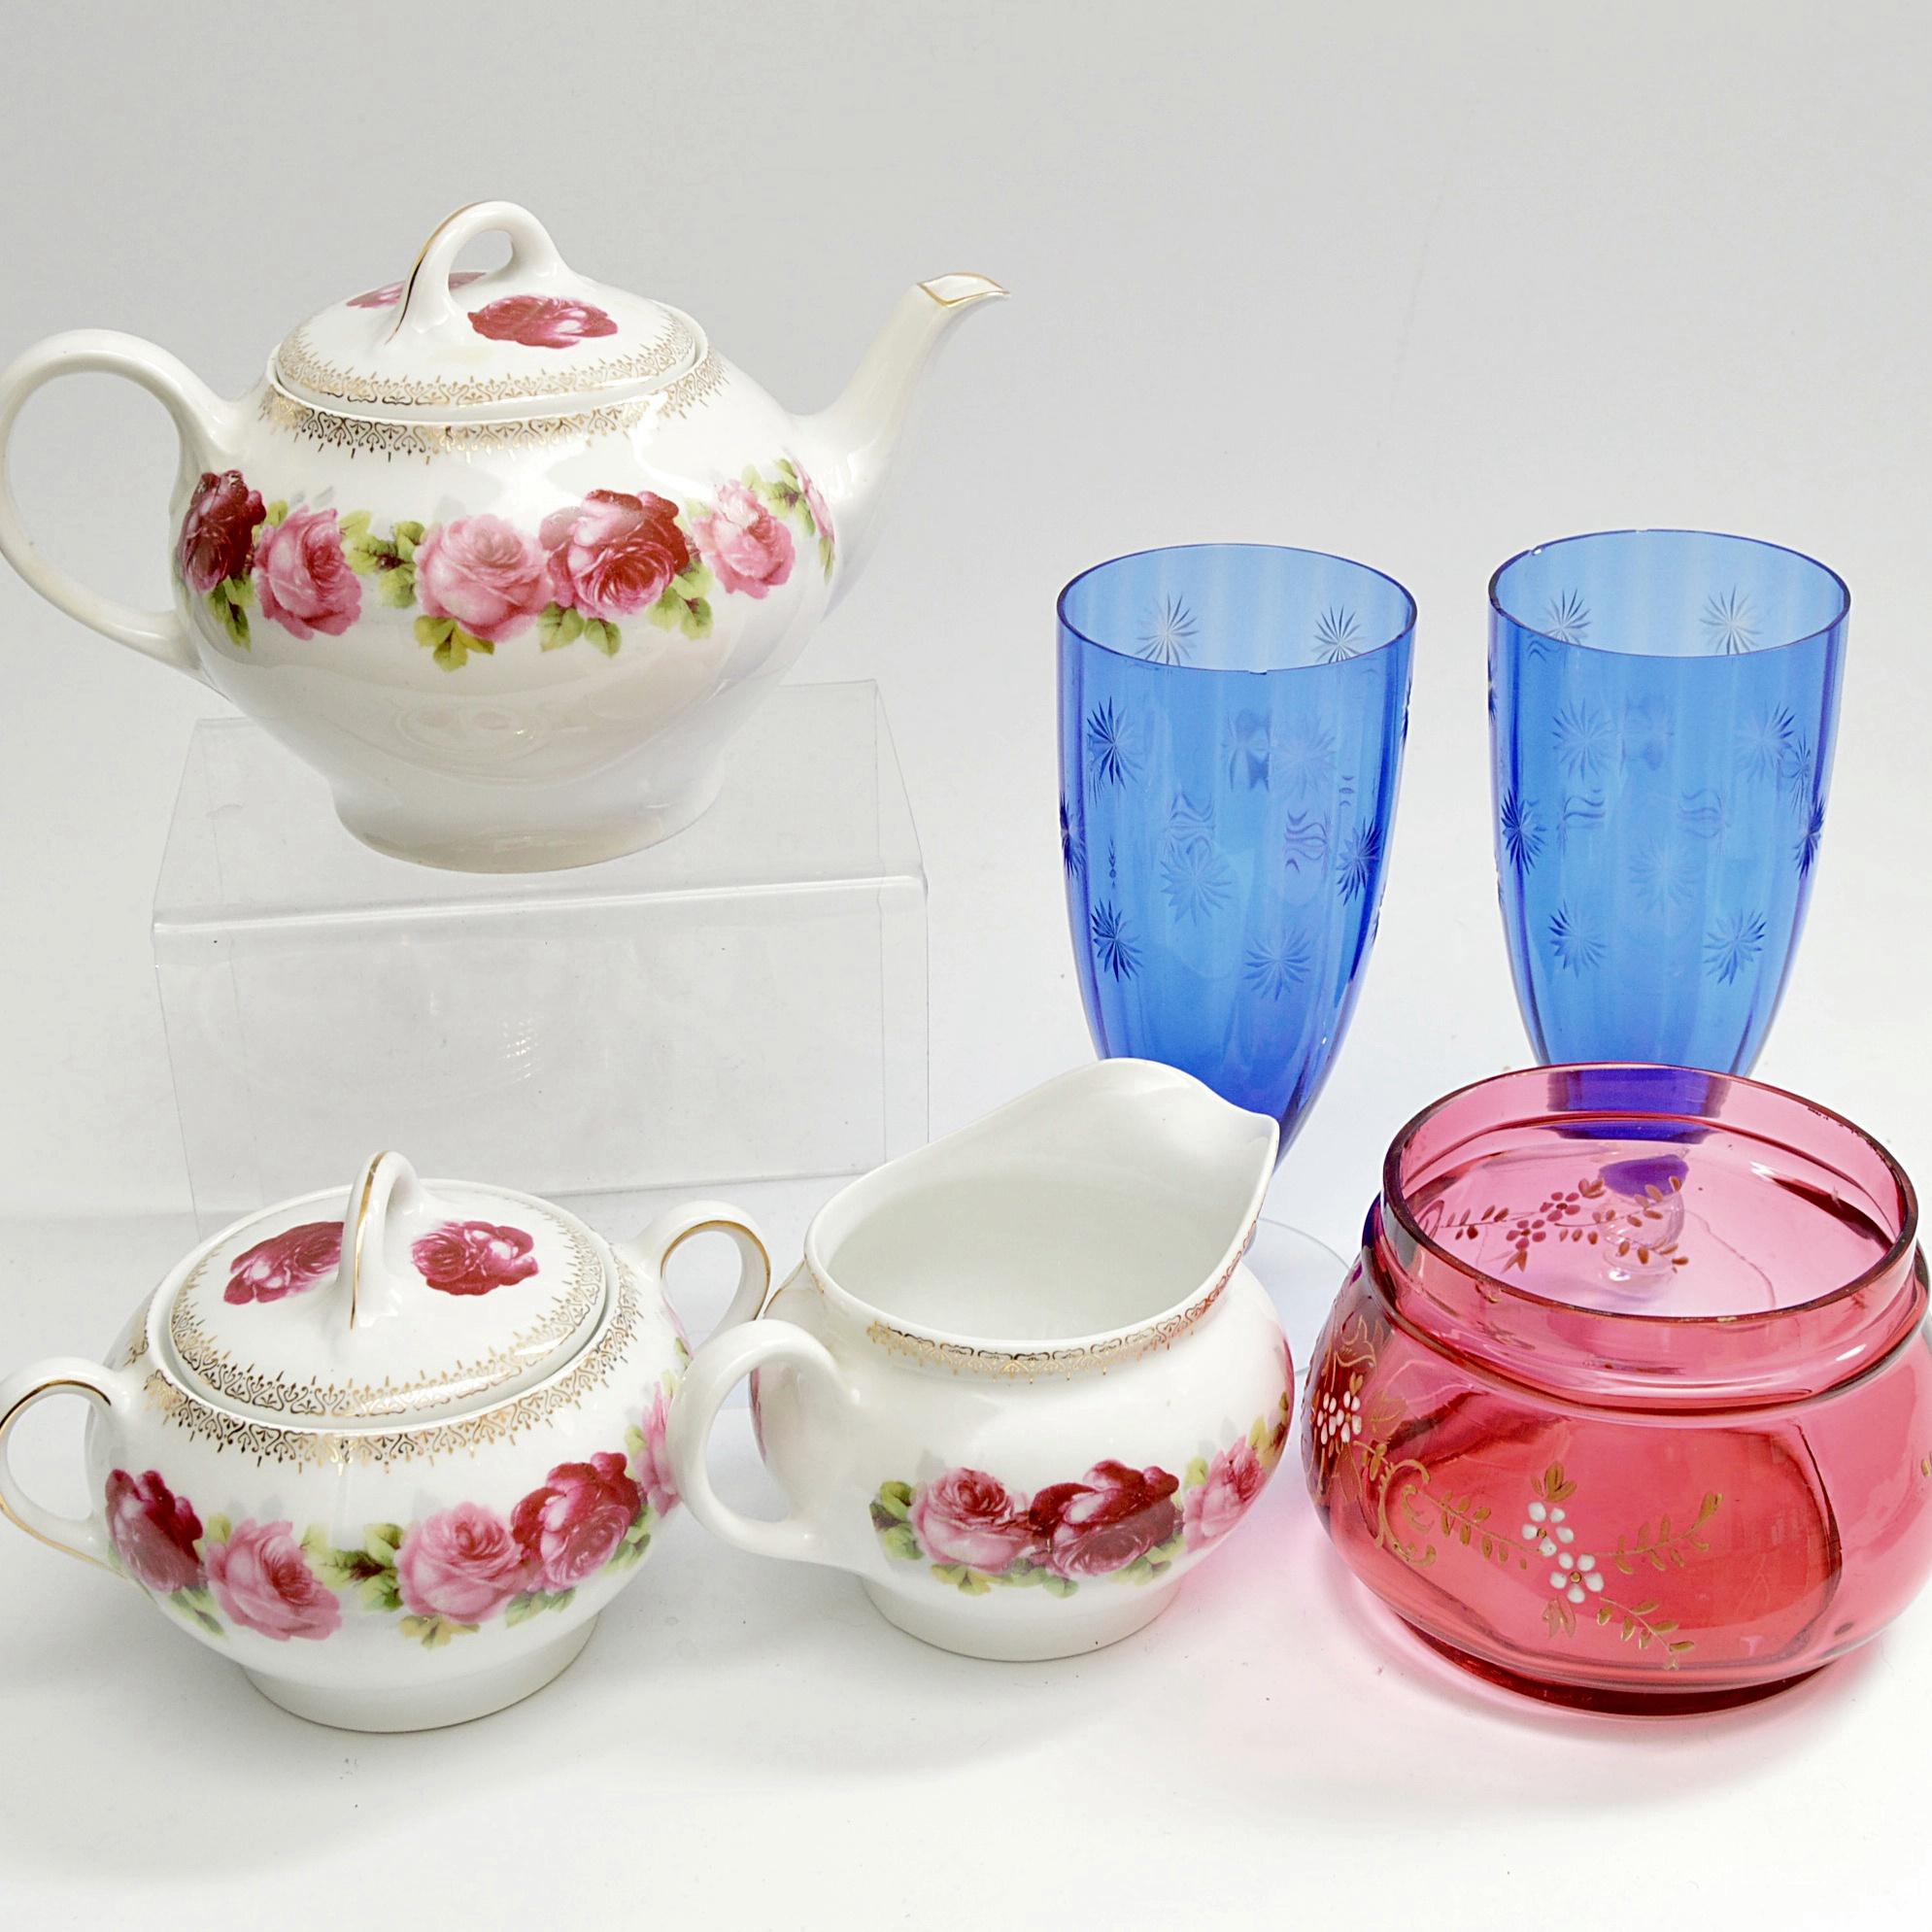 Antique Glassware And Porcelain Teaset